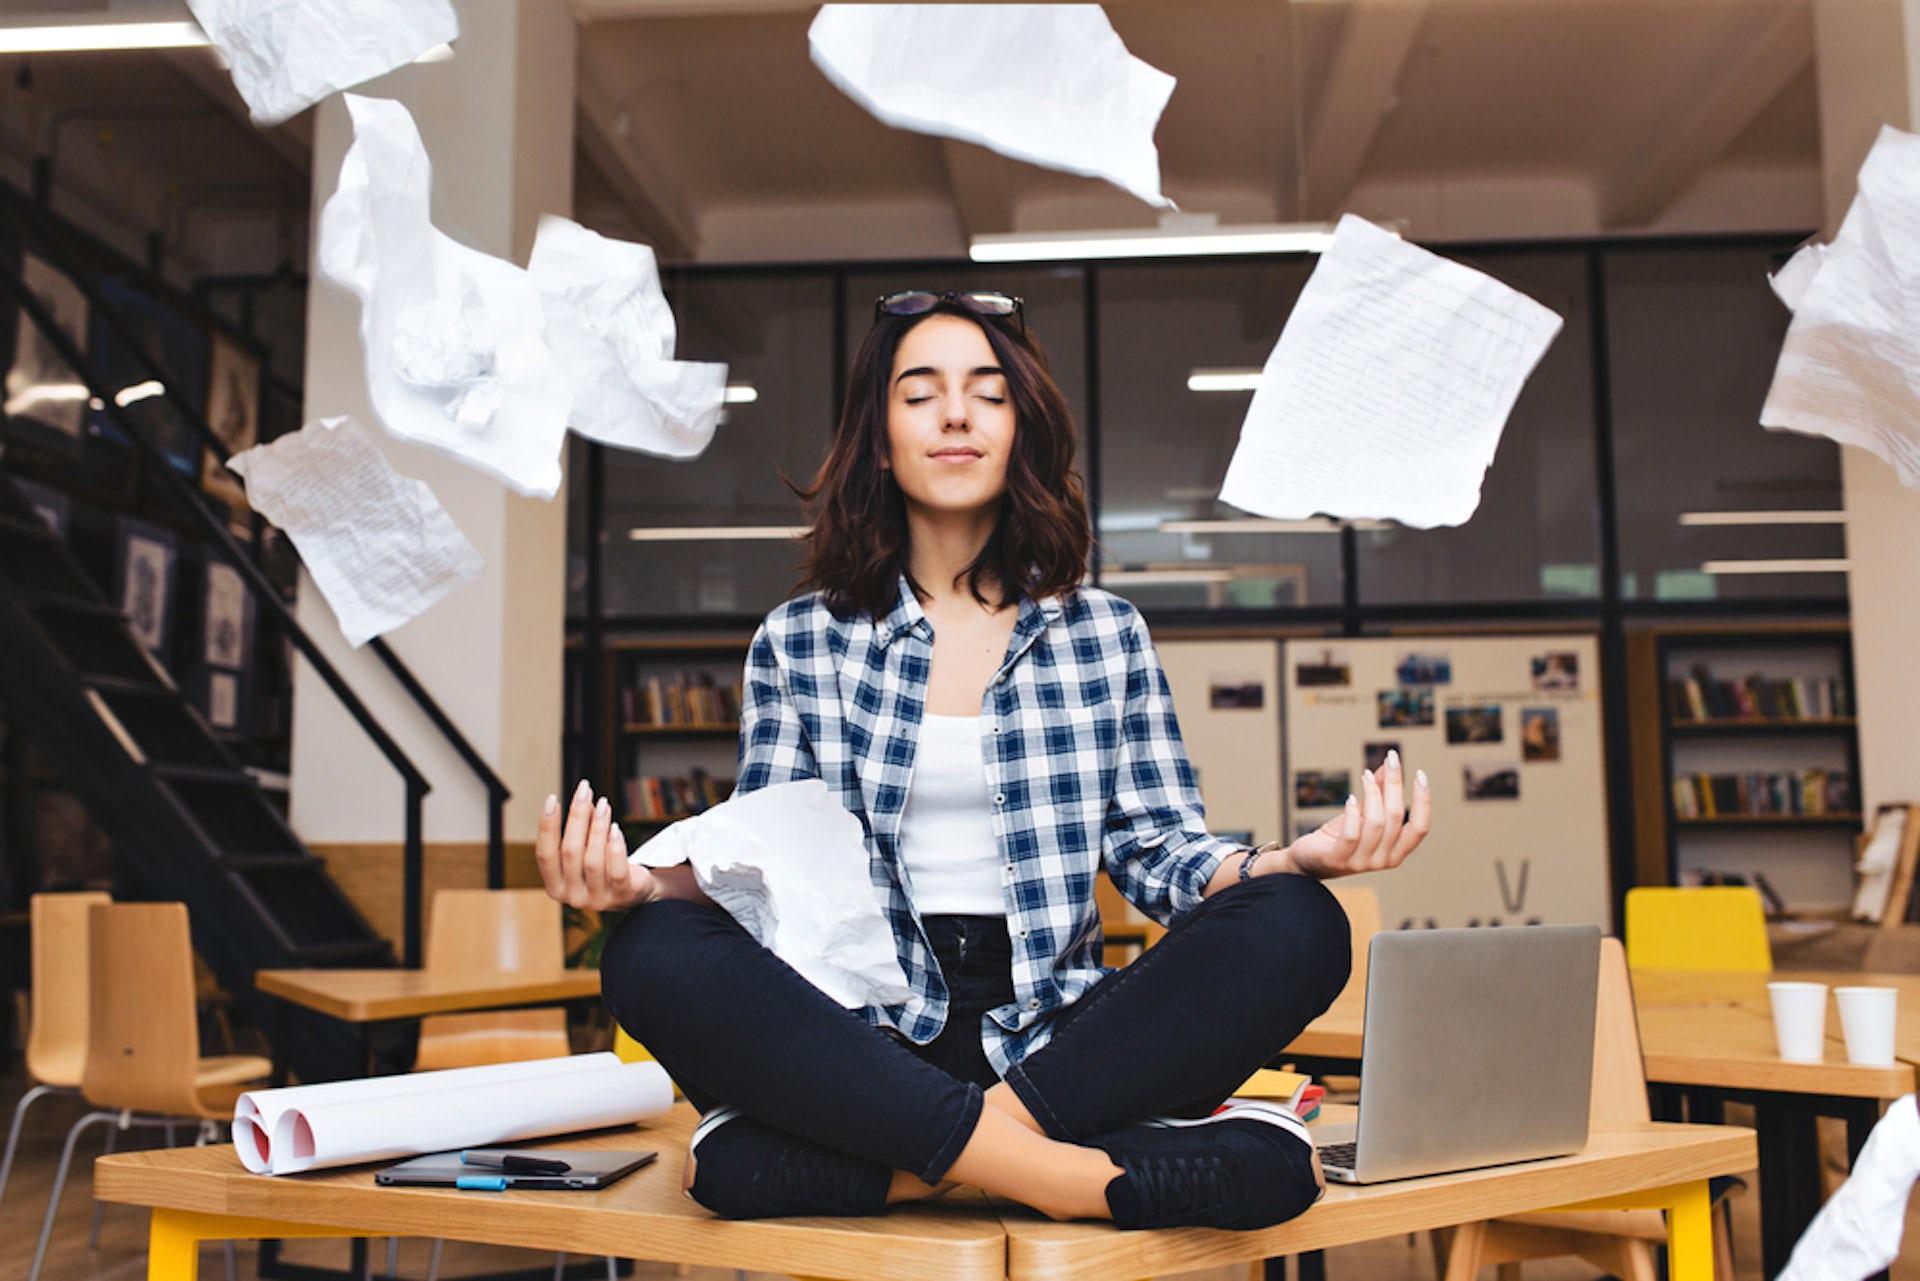 How to beat exam stress